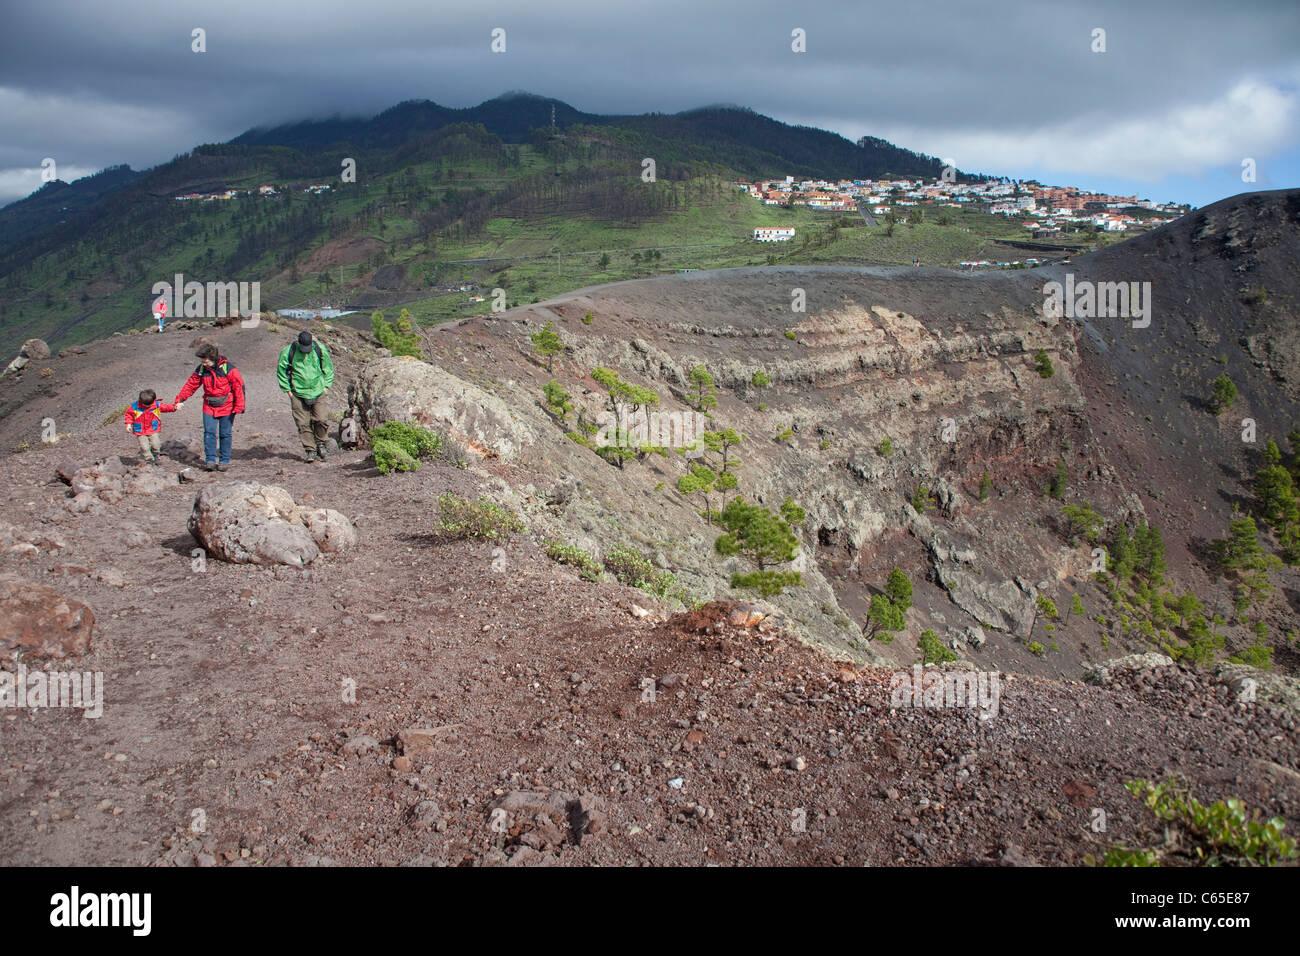 Menschen bin Vulkan San Antonio, Fuencaliente, Los Canarios, Menschen auf den Vulkan San Antonio, Fuencaliente, Stockbild